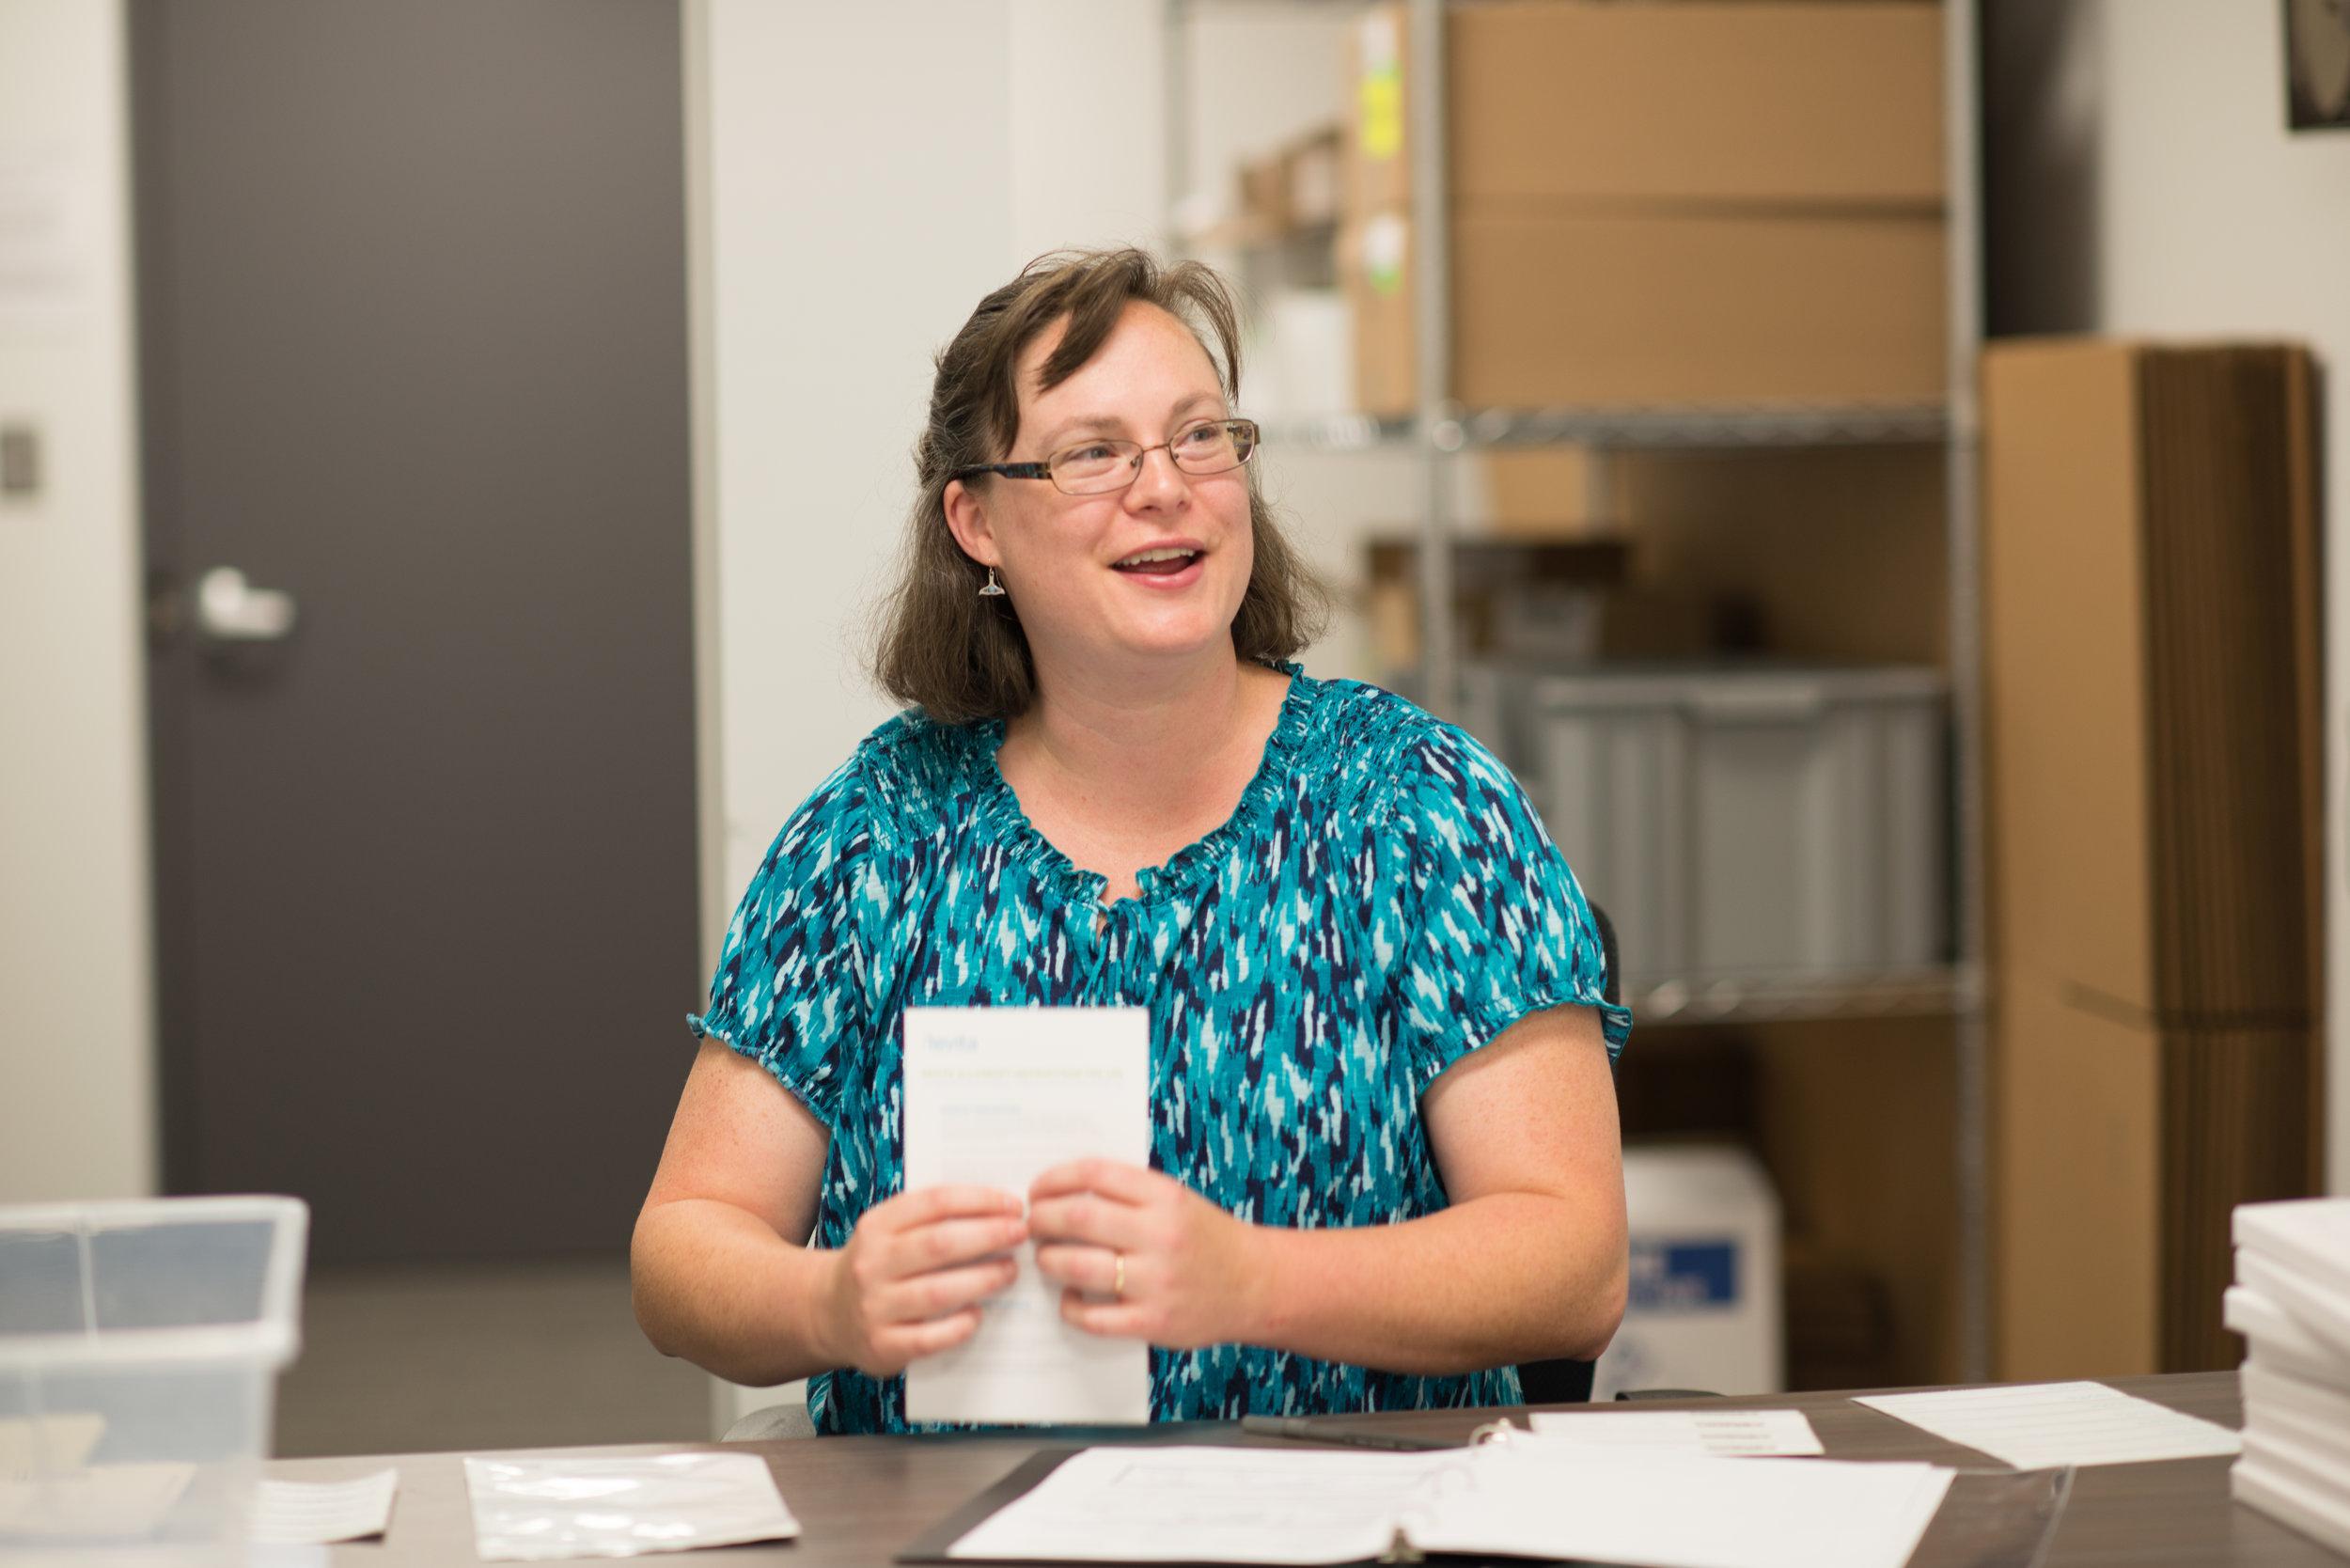 Christine Williams, Senior Quality Assurance Specialist